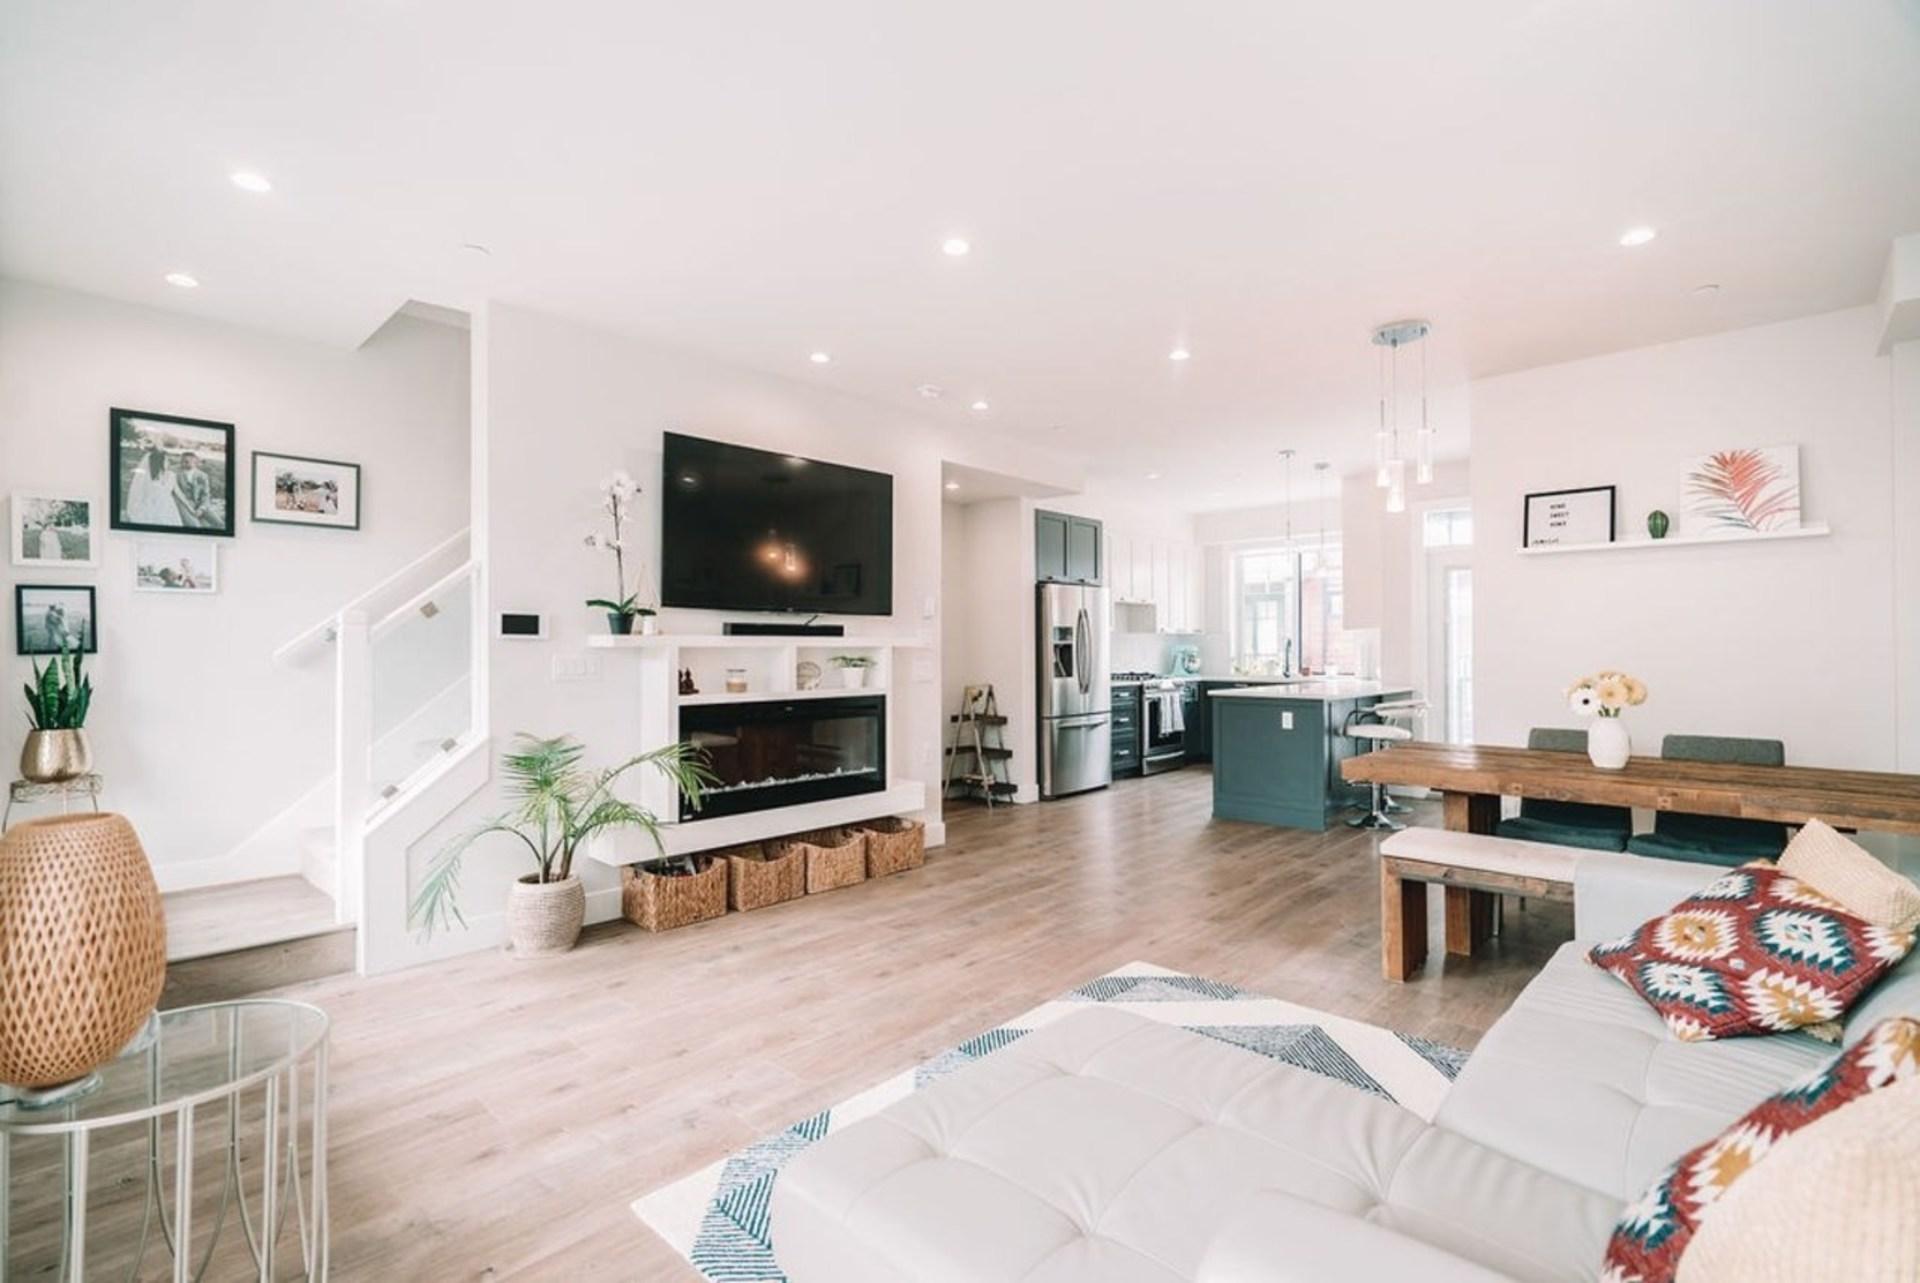 188-wood-street-queensborough-new-westminster-10 of 50 - 188 Wood Street, Queensborough, New Westminster